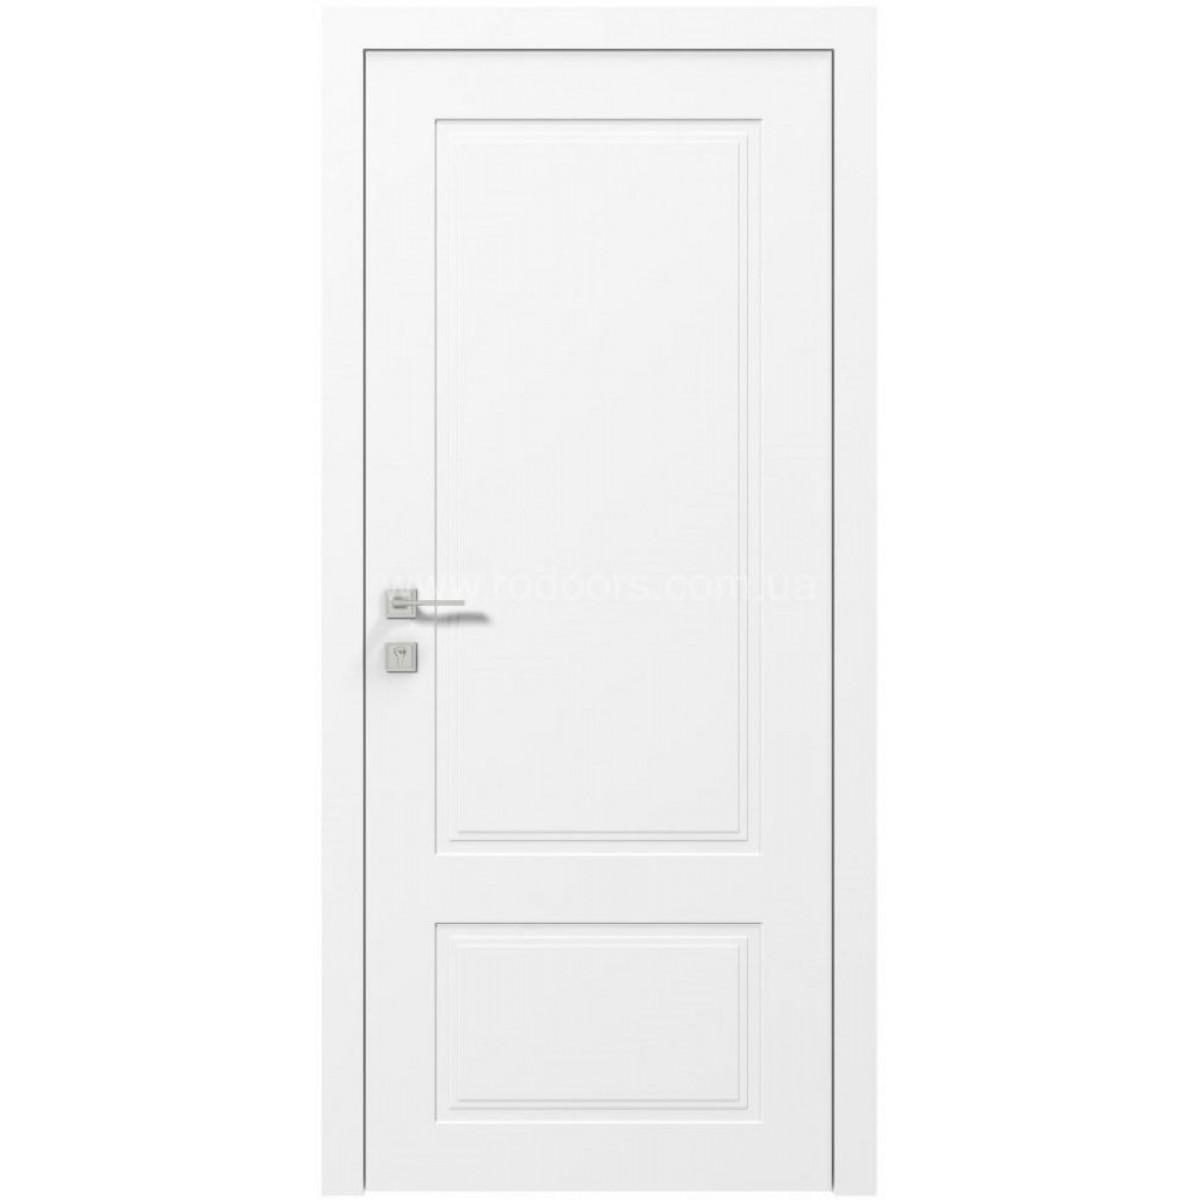 Межкомнатная дверь Cortes Galant белый мат Rodos